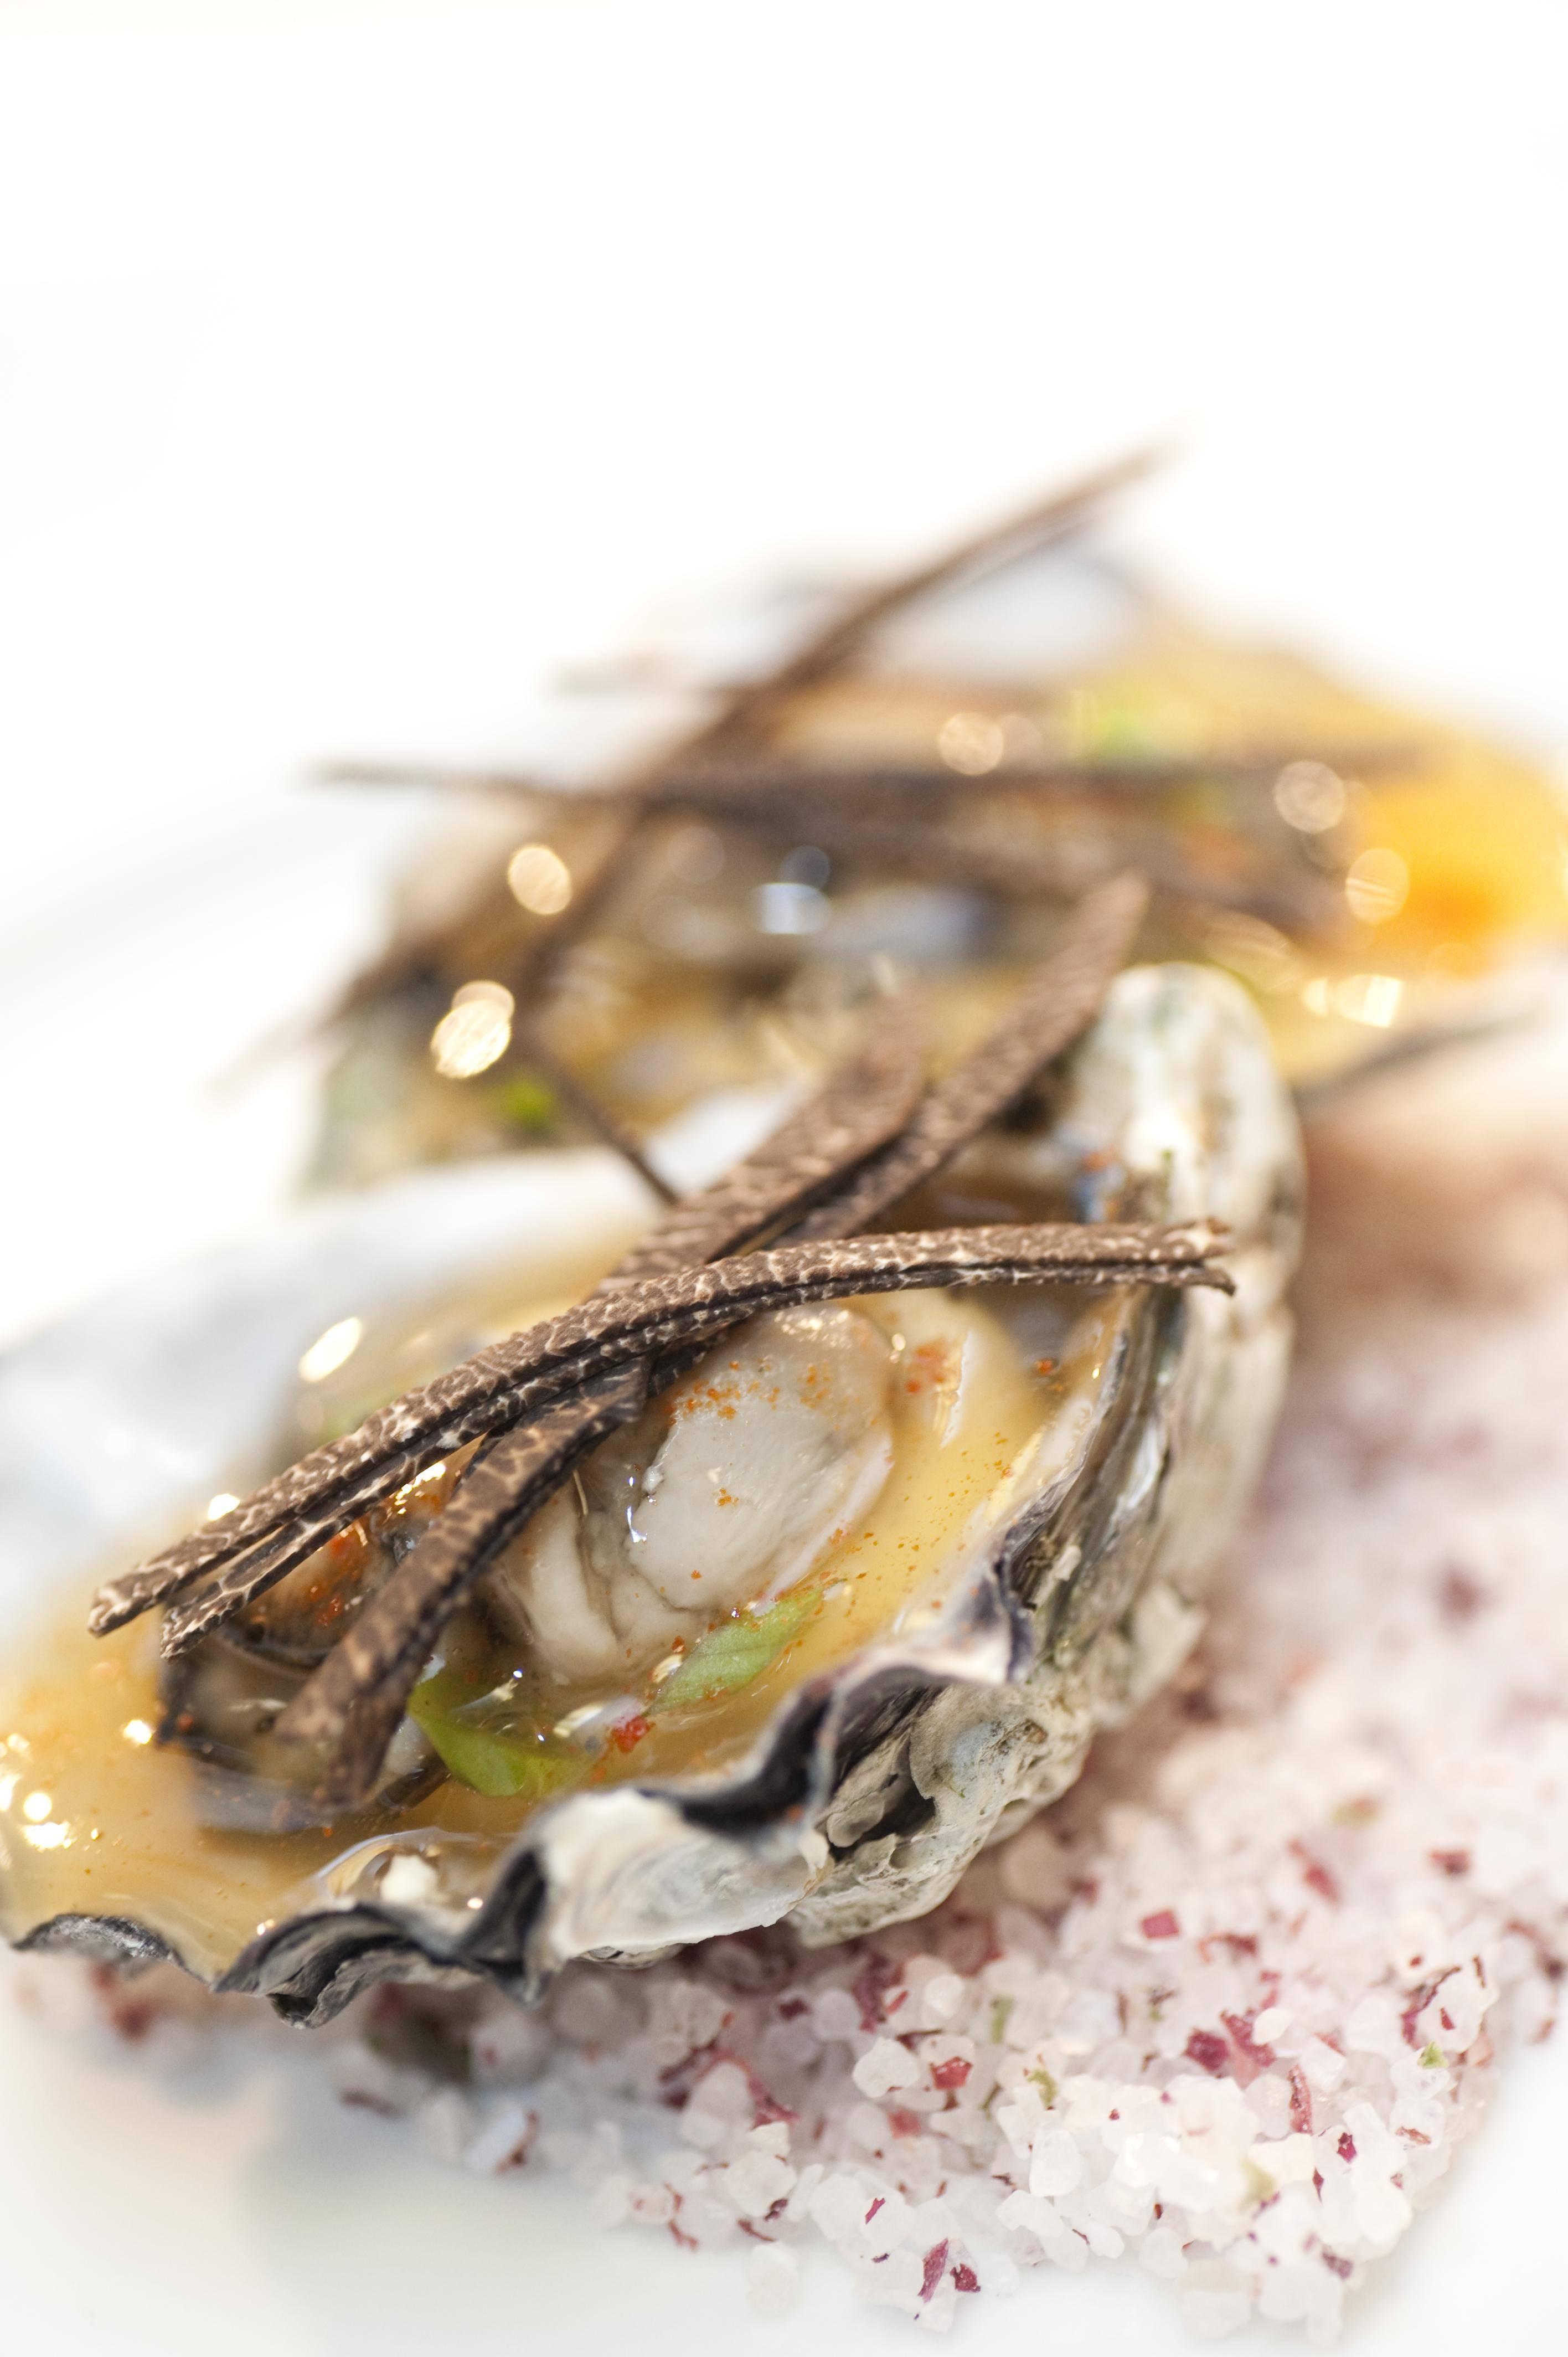 Oyster in Gelee with Leeks and Black Truffle…˙Ú∫≈‰¥–Àø∫Õ∫⁄À…¬∂